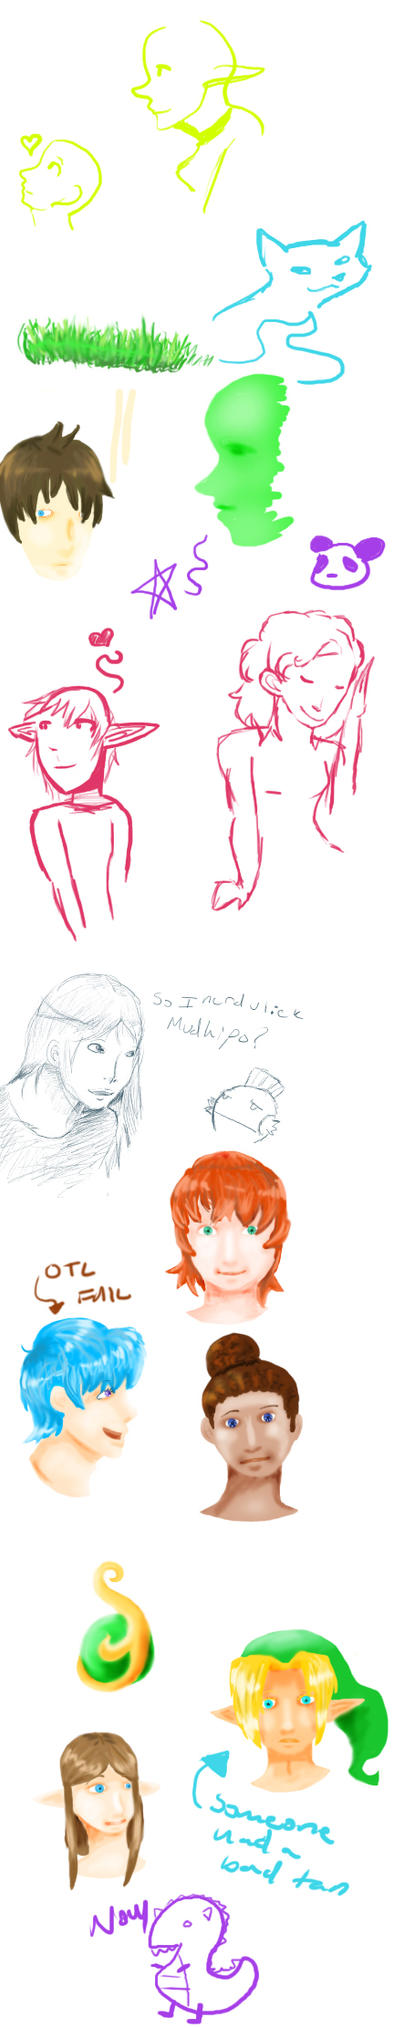 Sketches: technique practice by Twilian-Princess